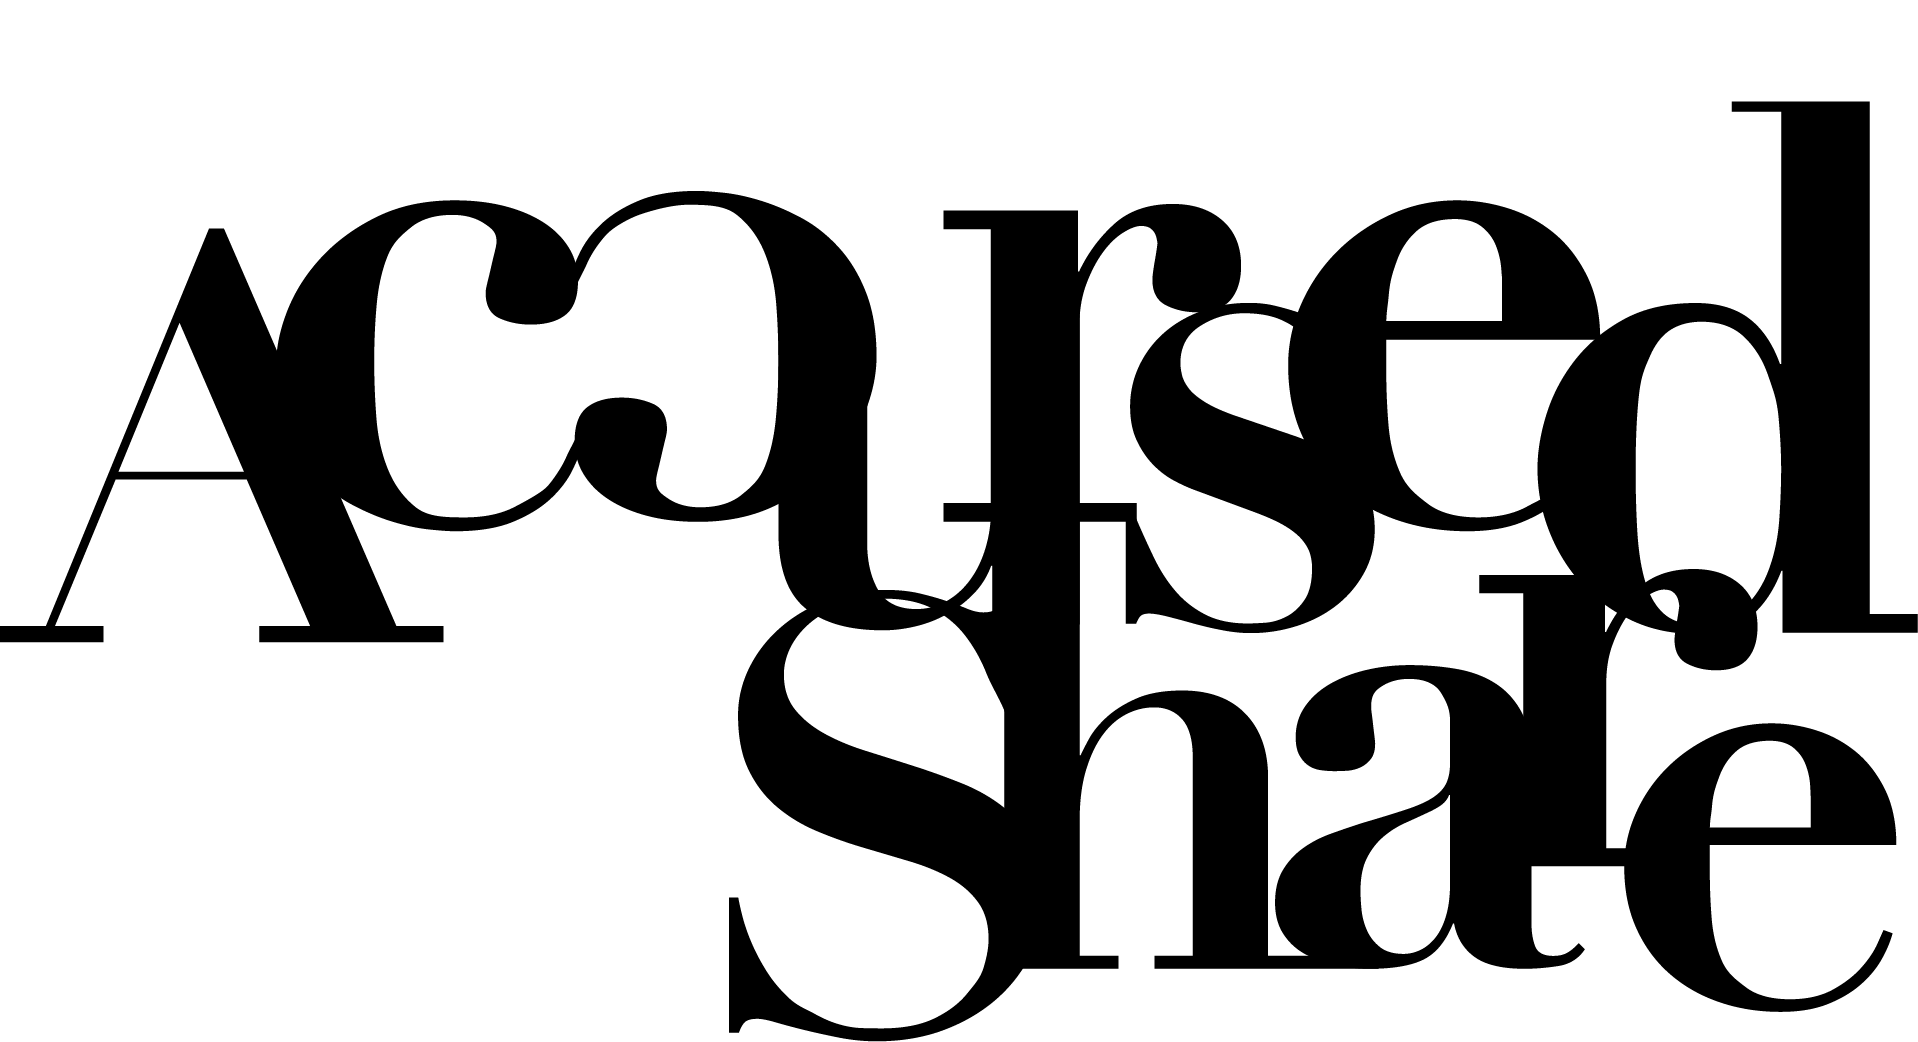 Accursed Share logo